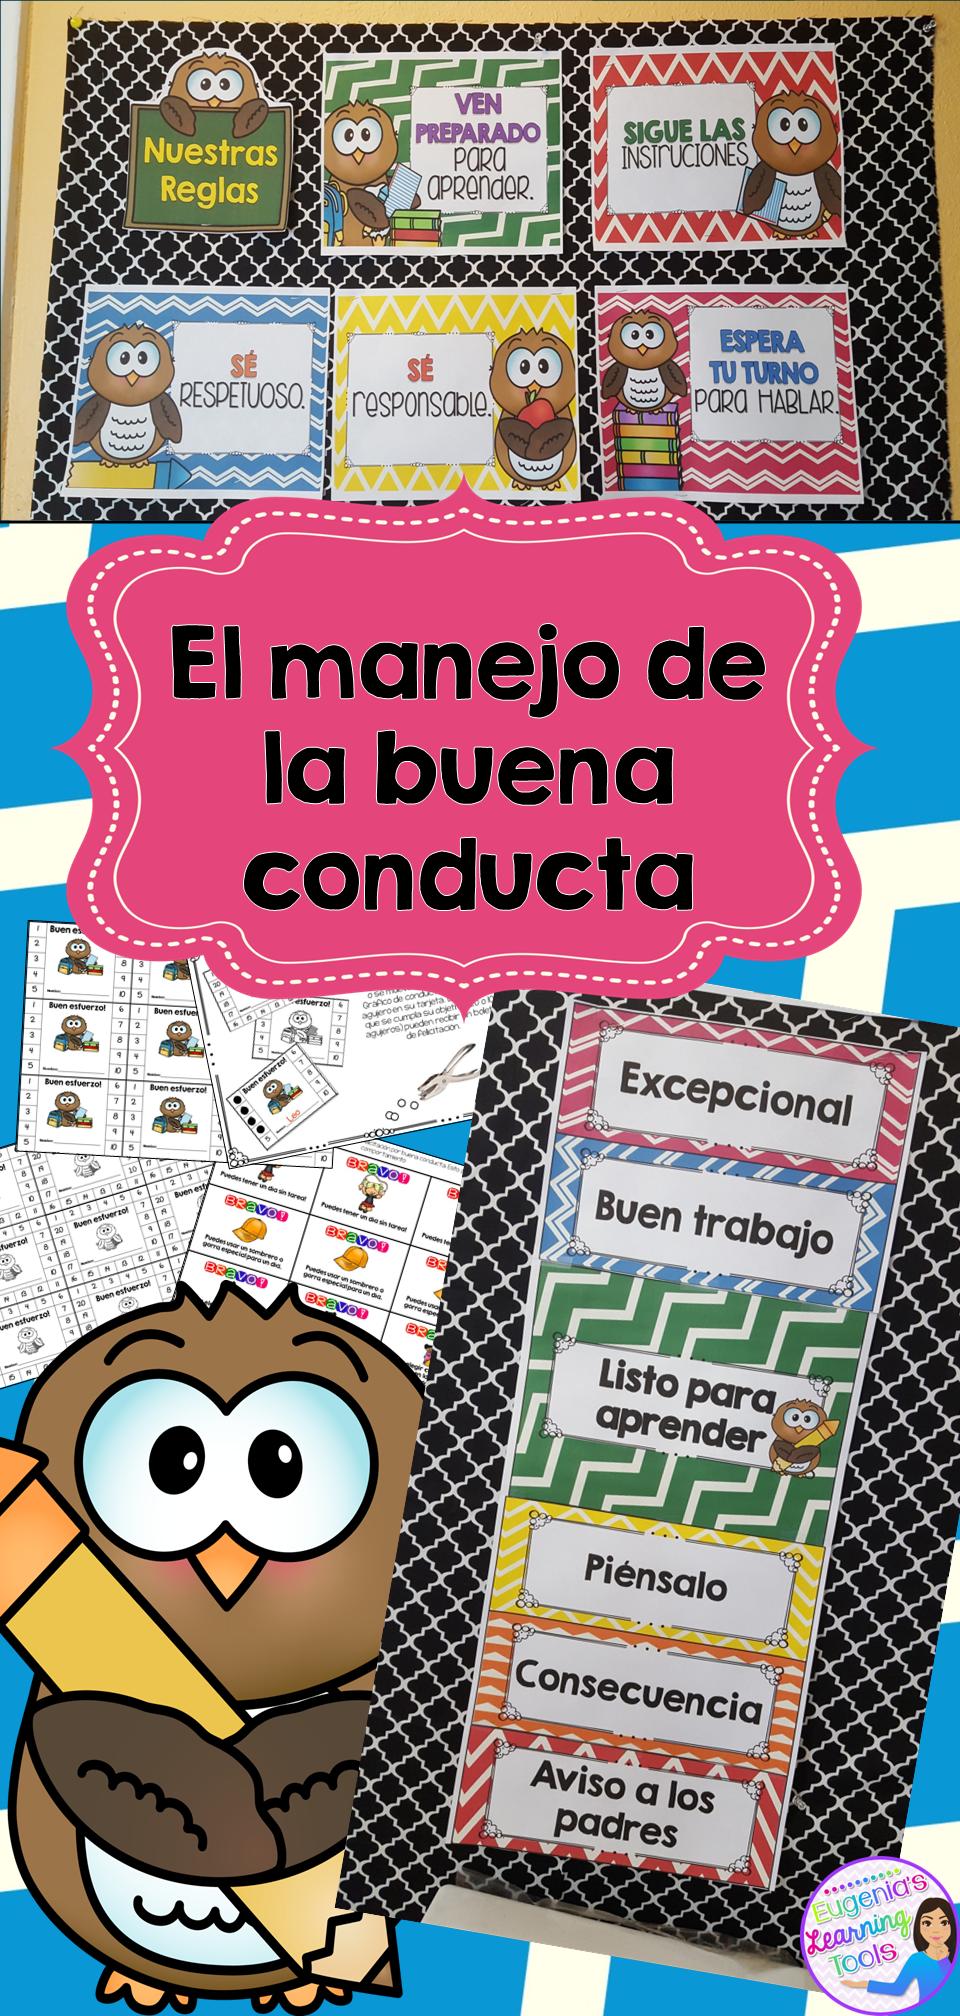 Las reglas de la clase   SPANISH Learning   Pinterest